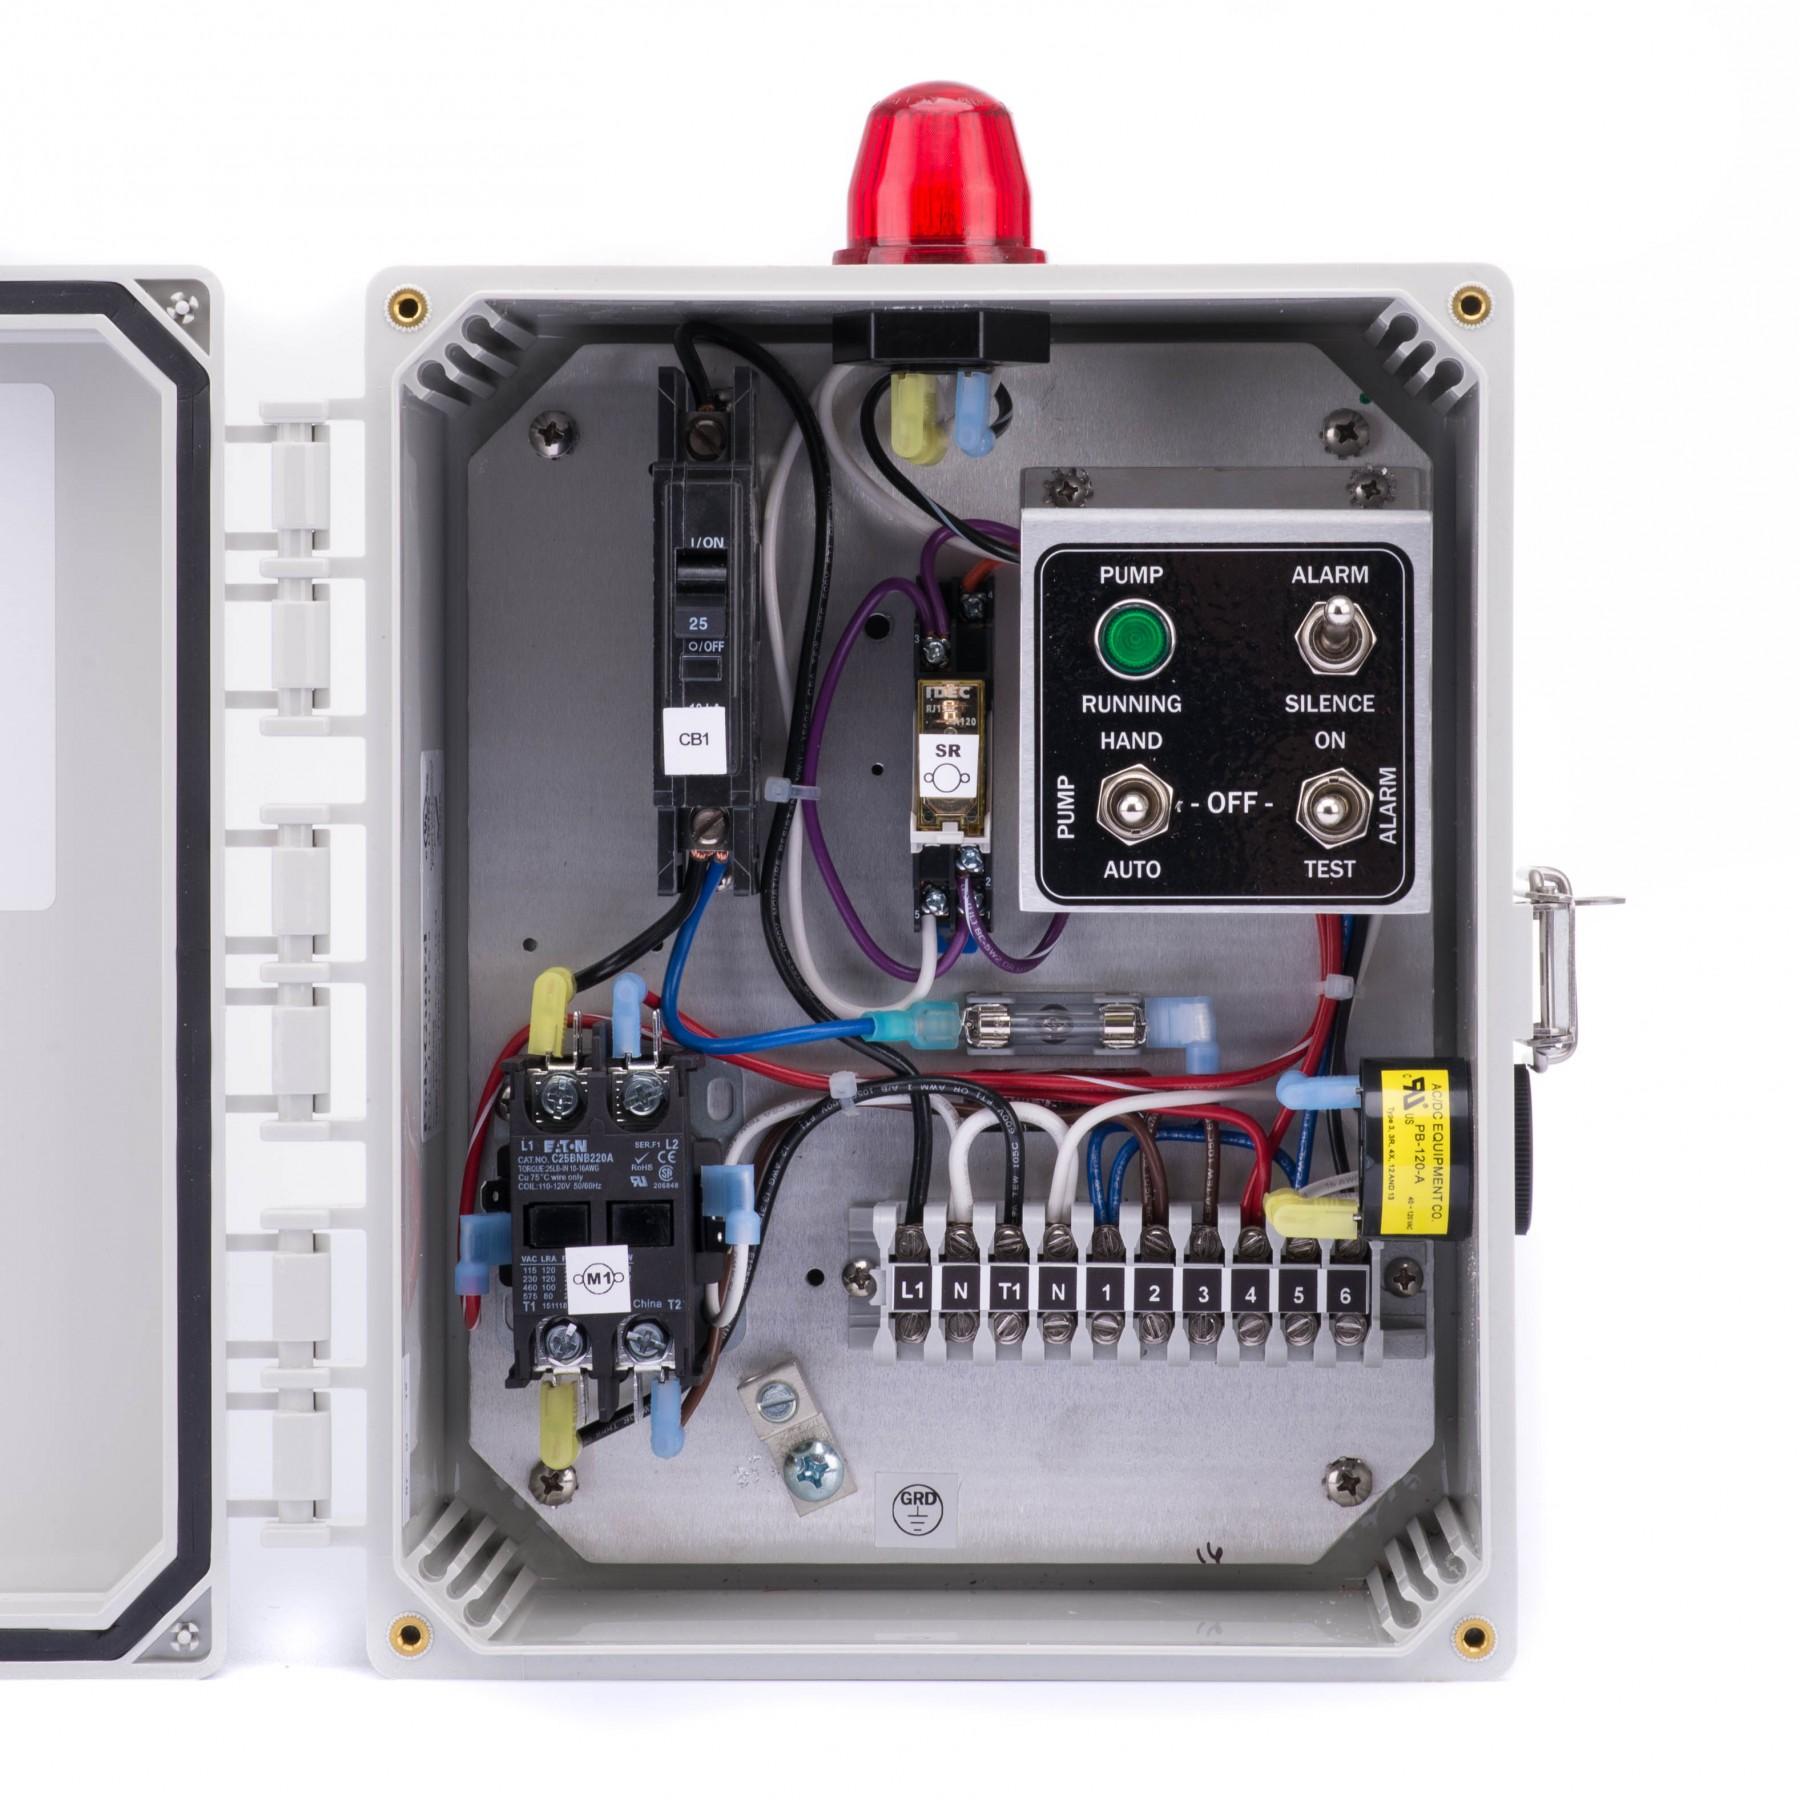 wiring diagram 3 5 shop vac shop vac plug wiring diagram